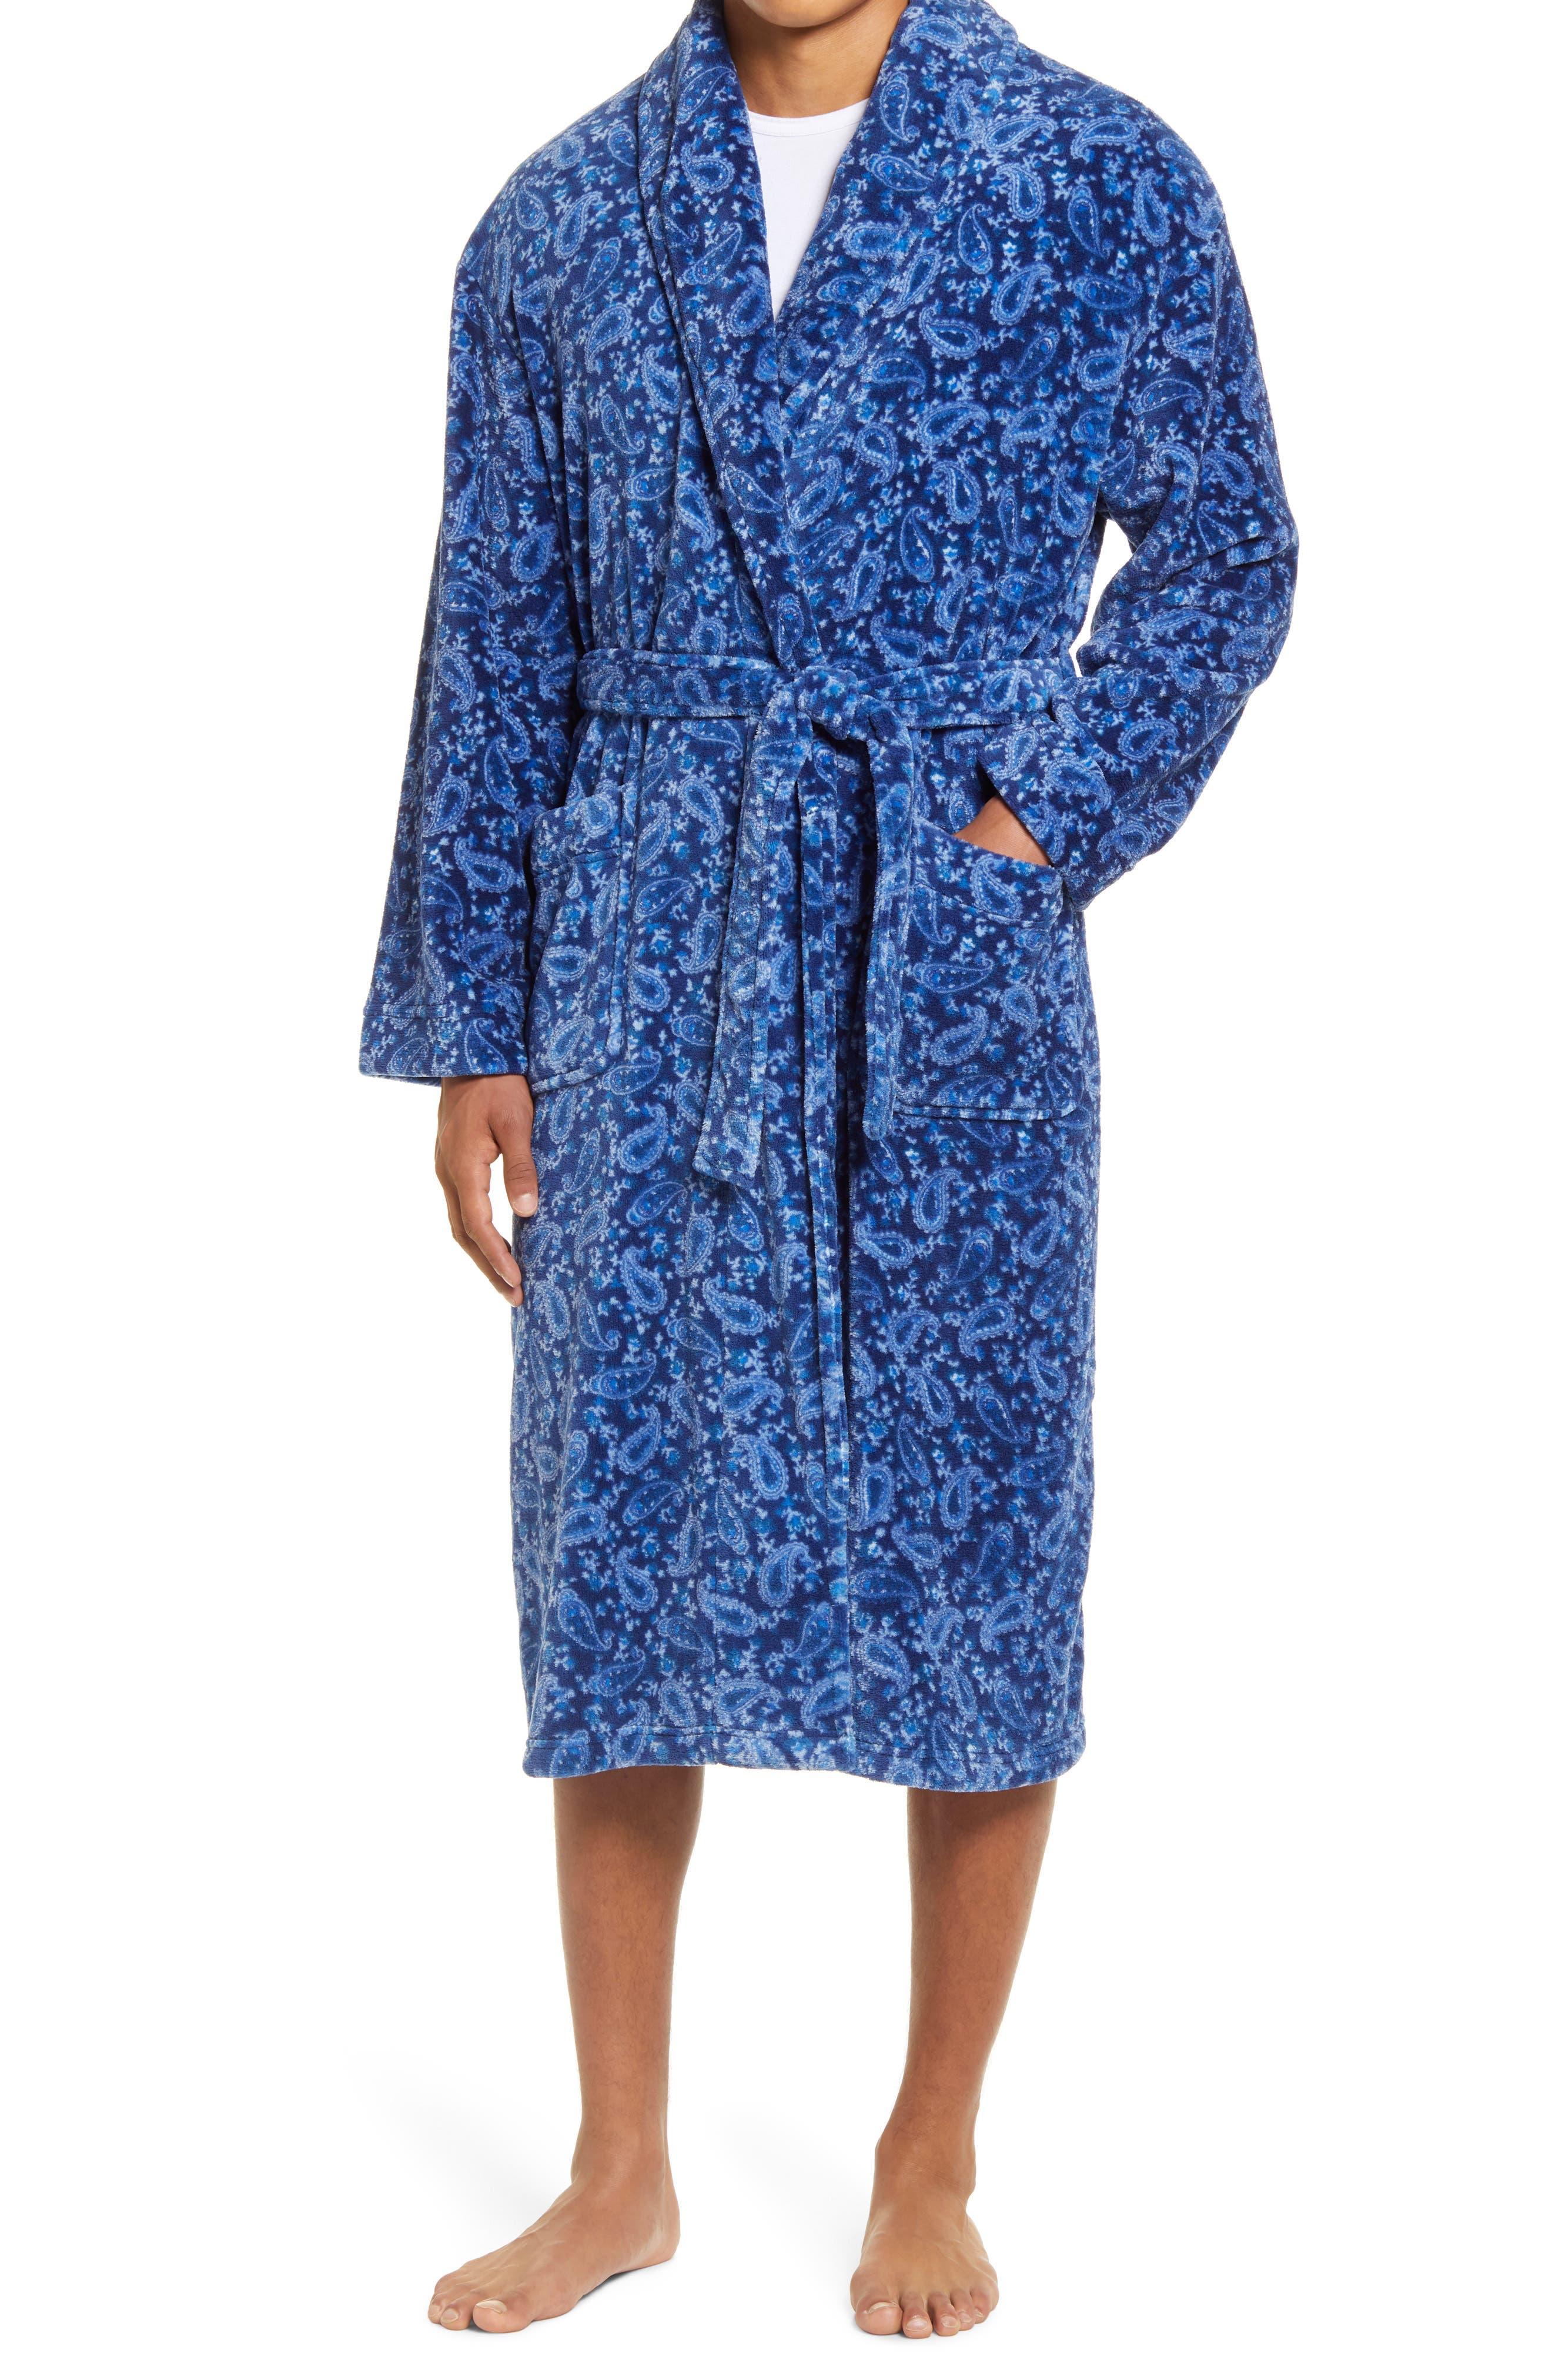 Past And Present Plush Robe